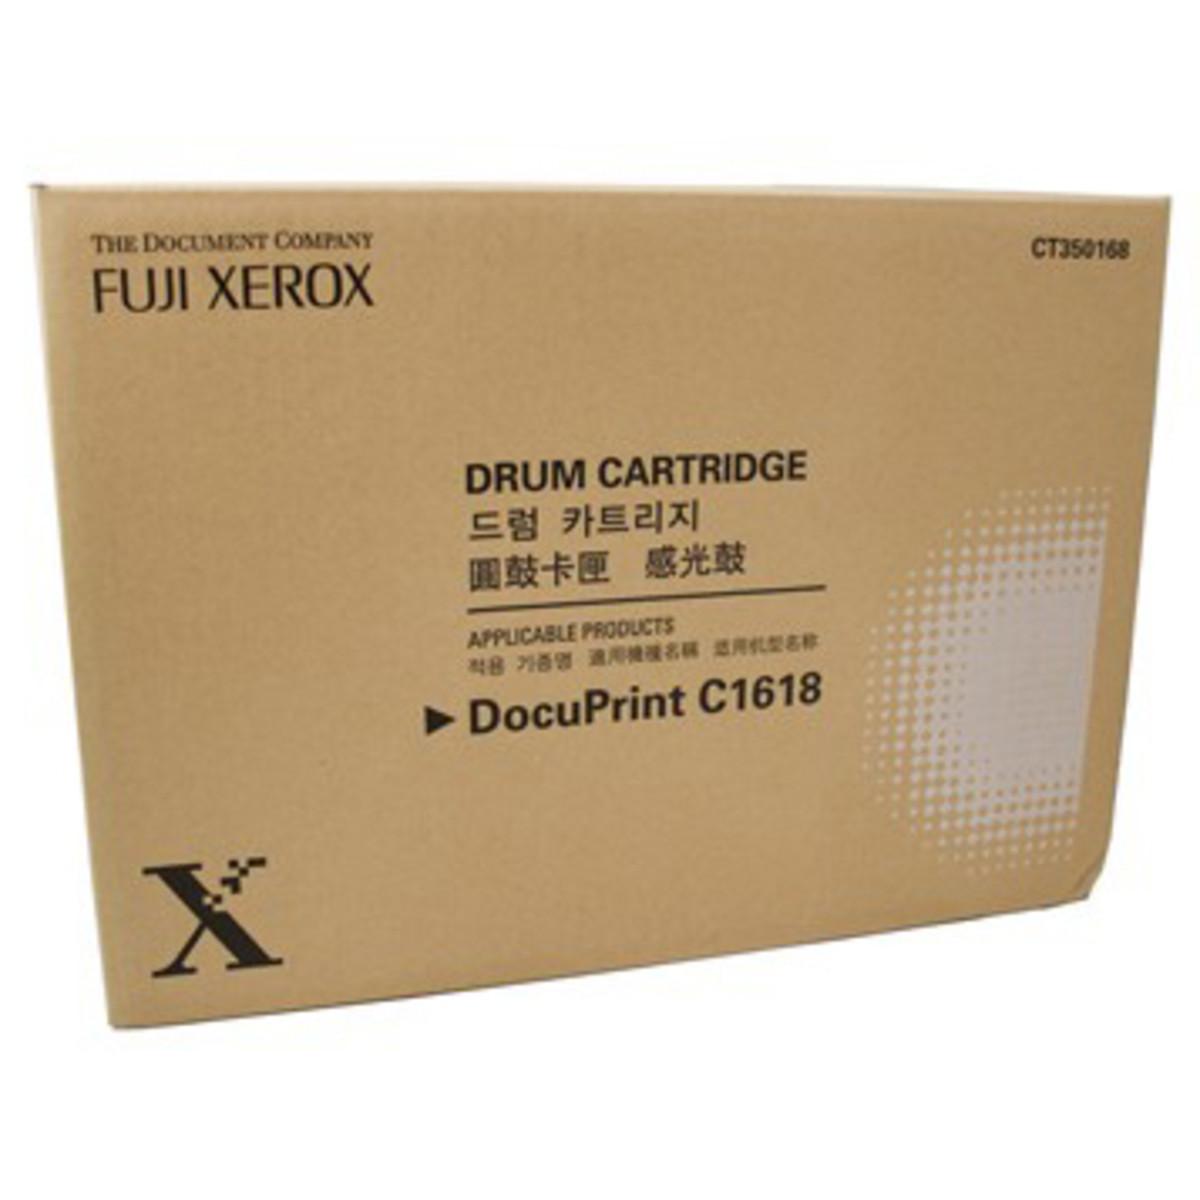 Xerox CT350168 Drum Unit